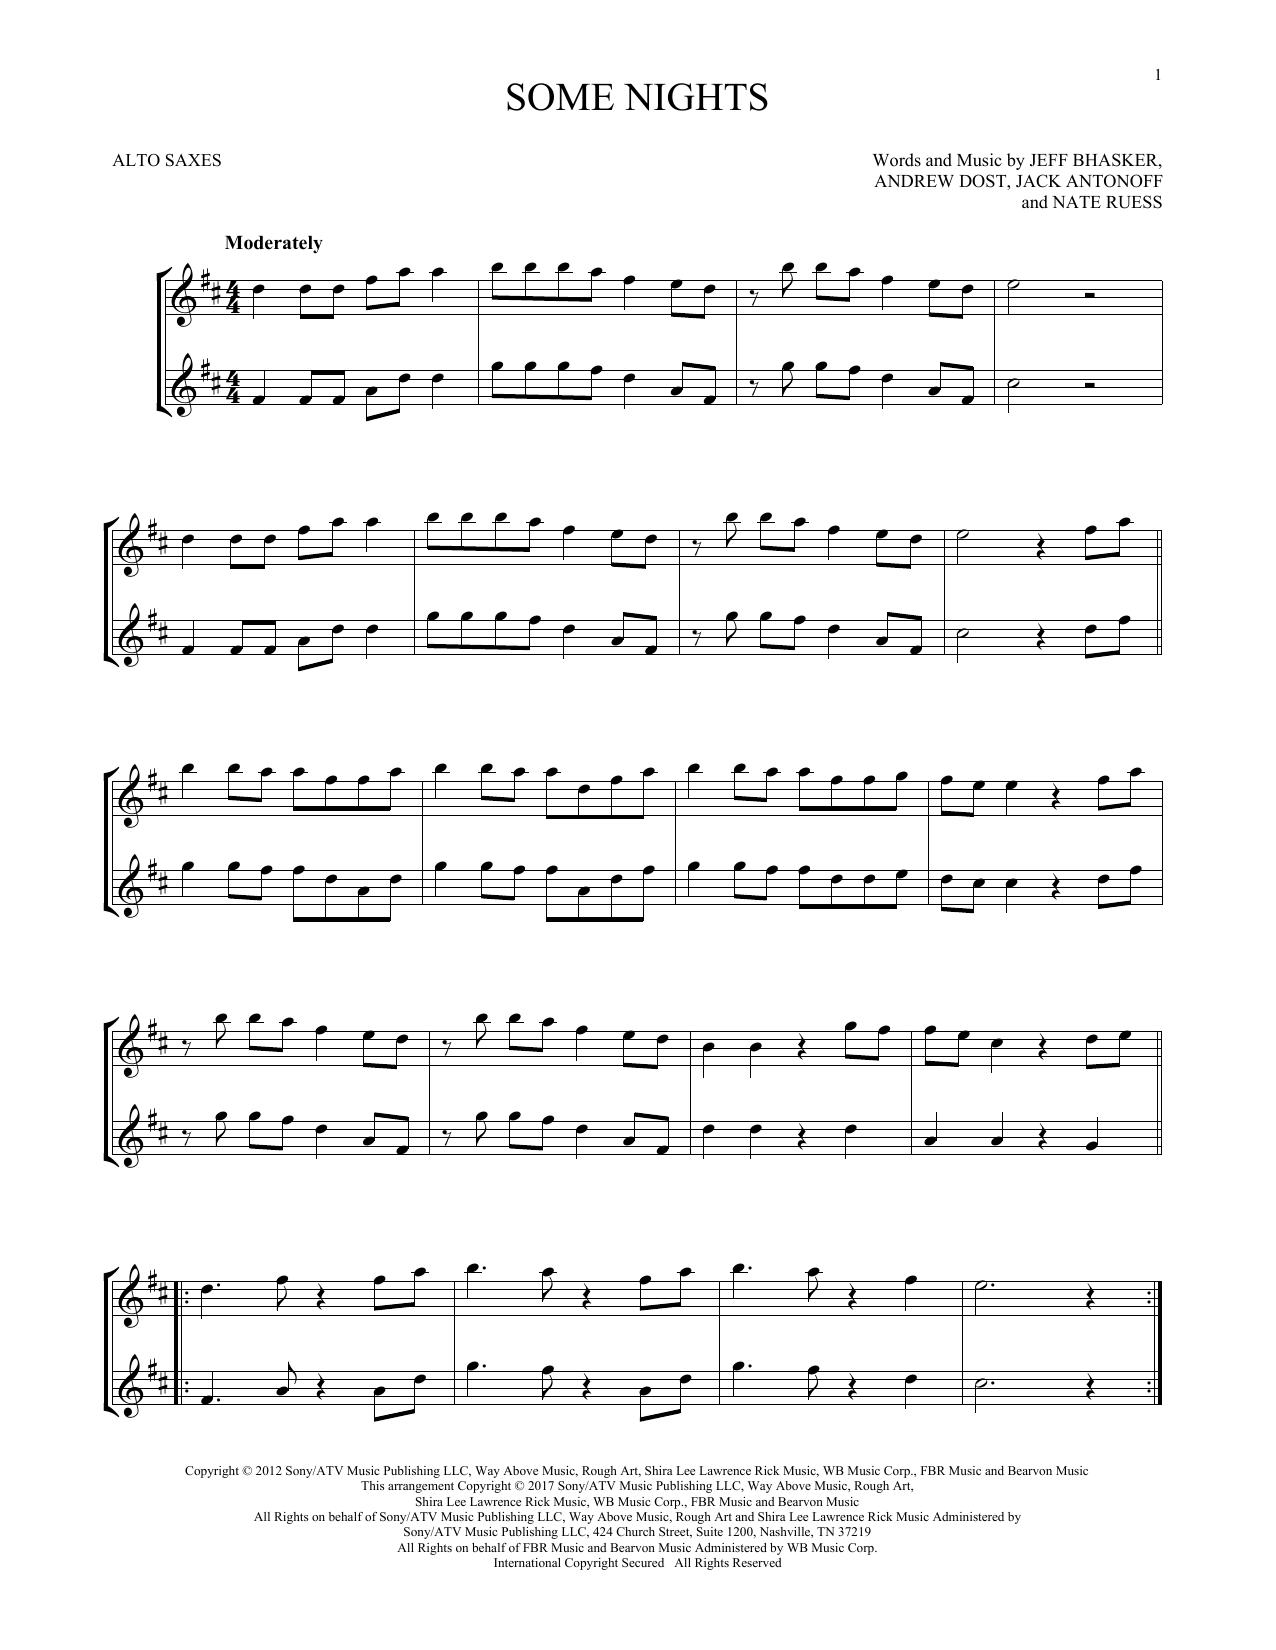 Sheet Music Digital Files To Print Licensed Fun Digital Sheet Music